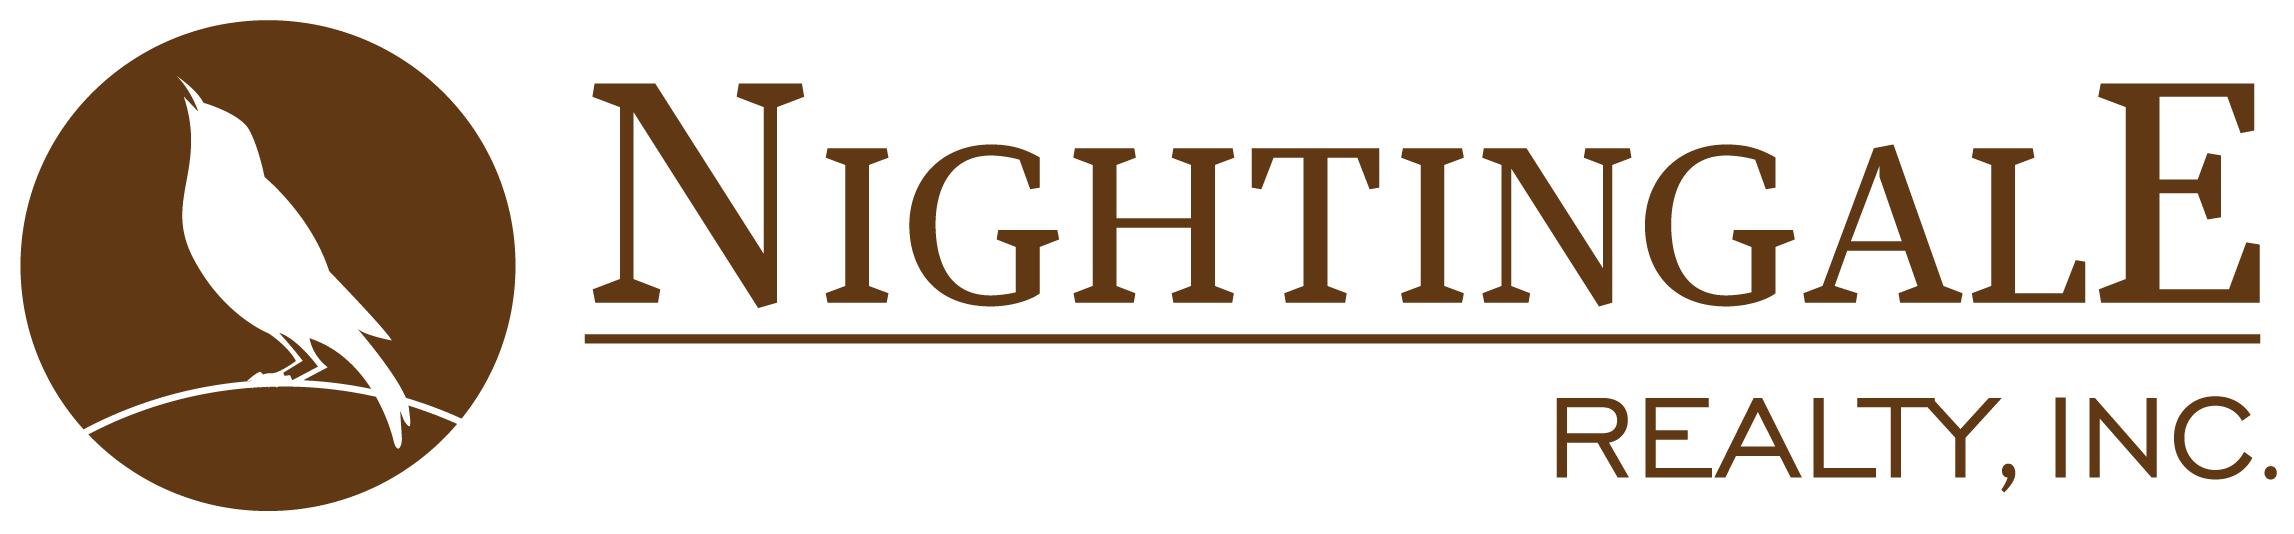 Nightingale Realty